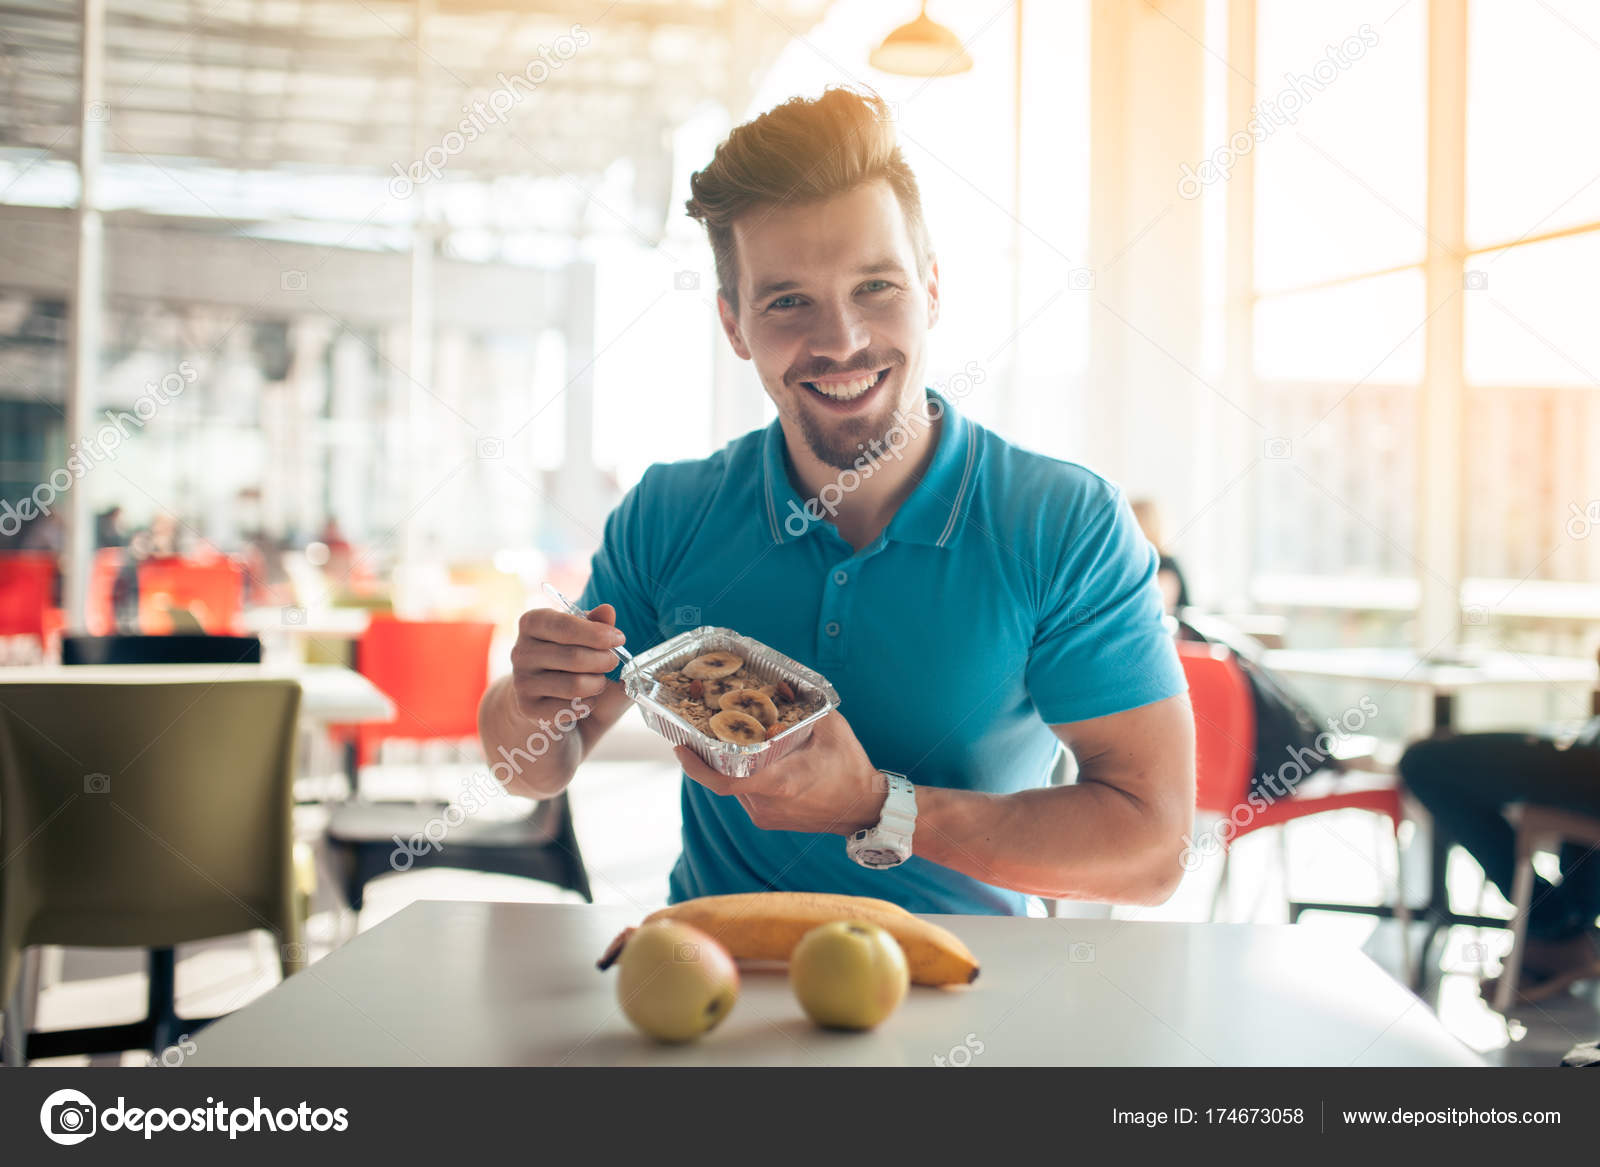 Junge Hubscher Kerl Hat Gesundes Fruhstuck Im Cafe Stockfoto